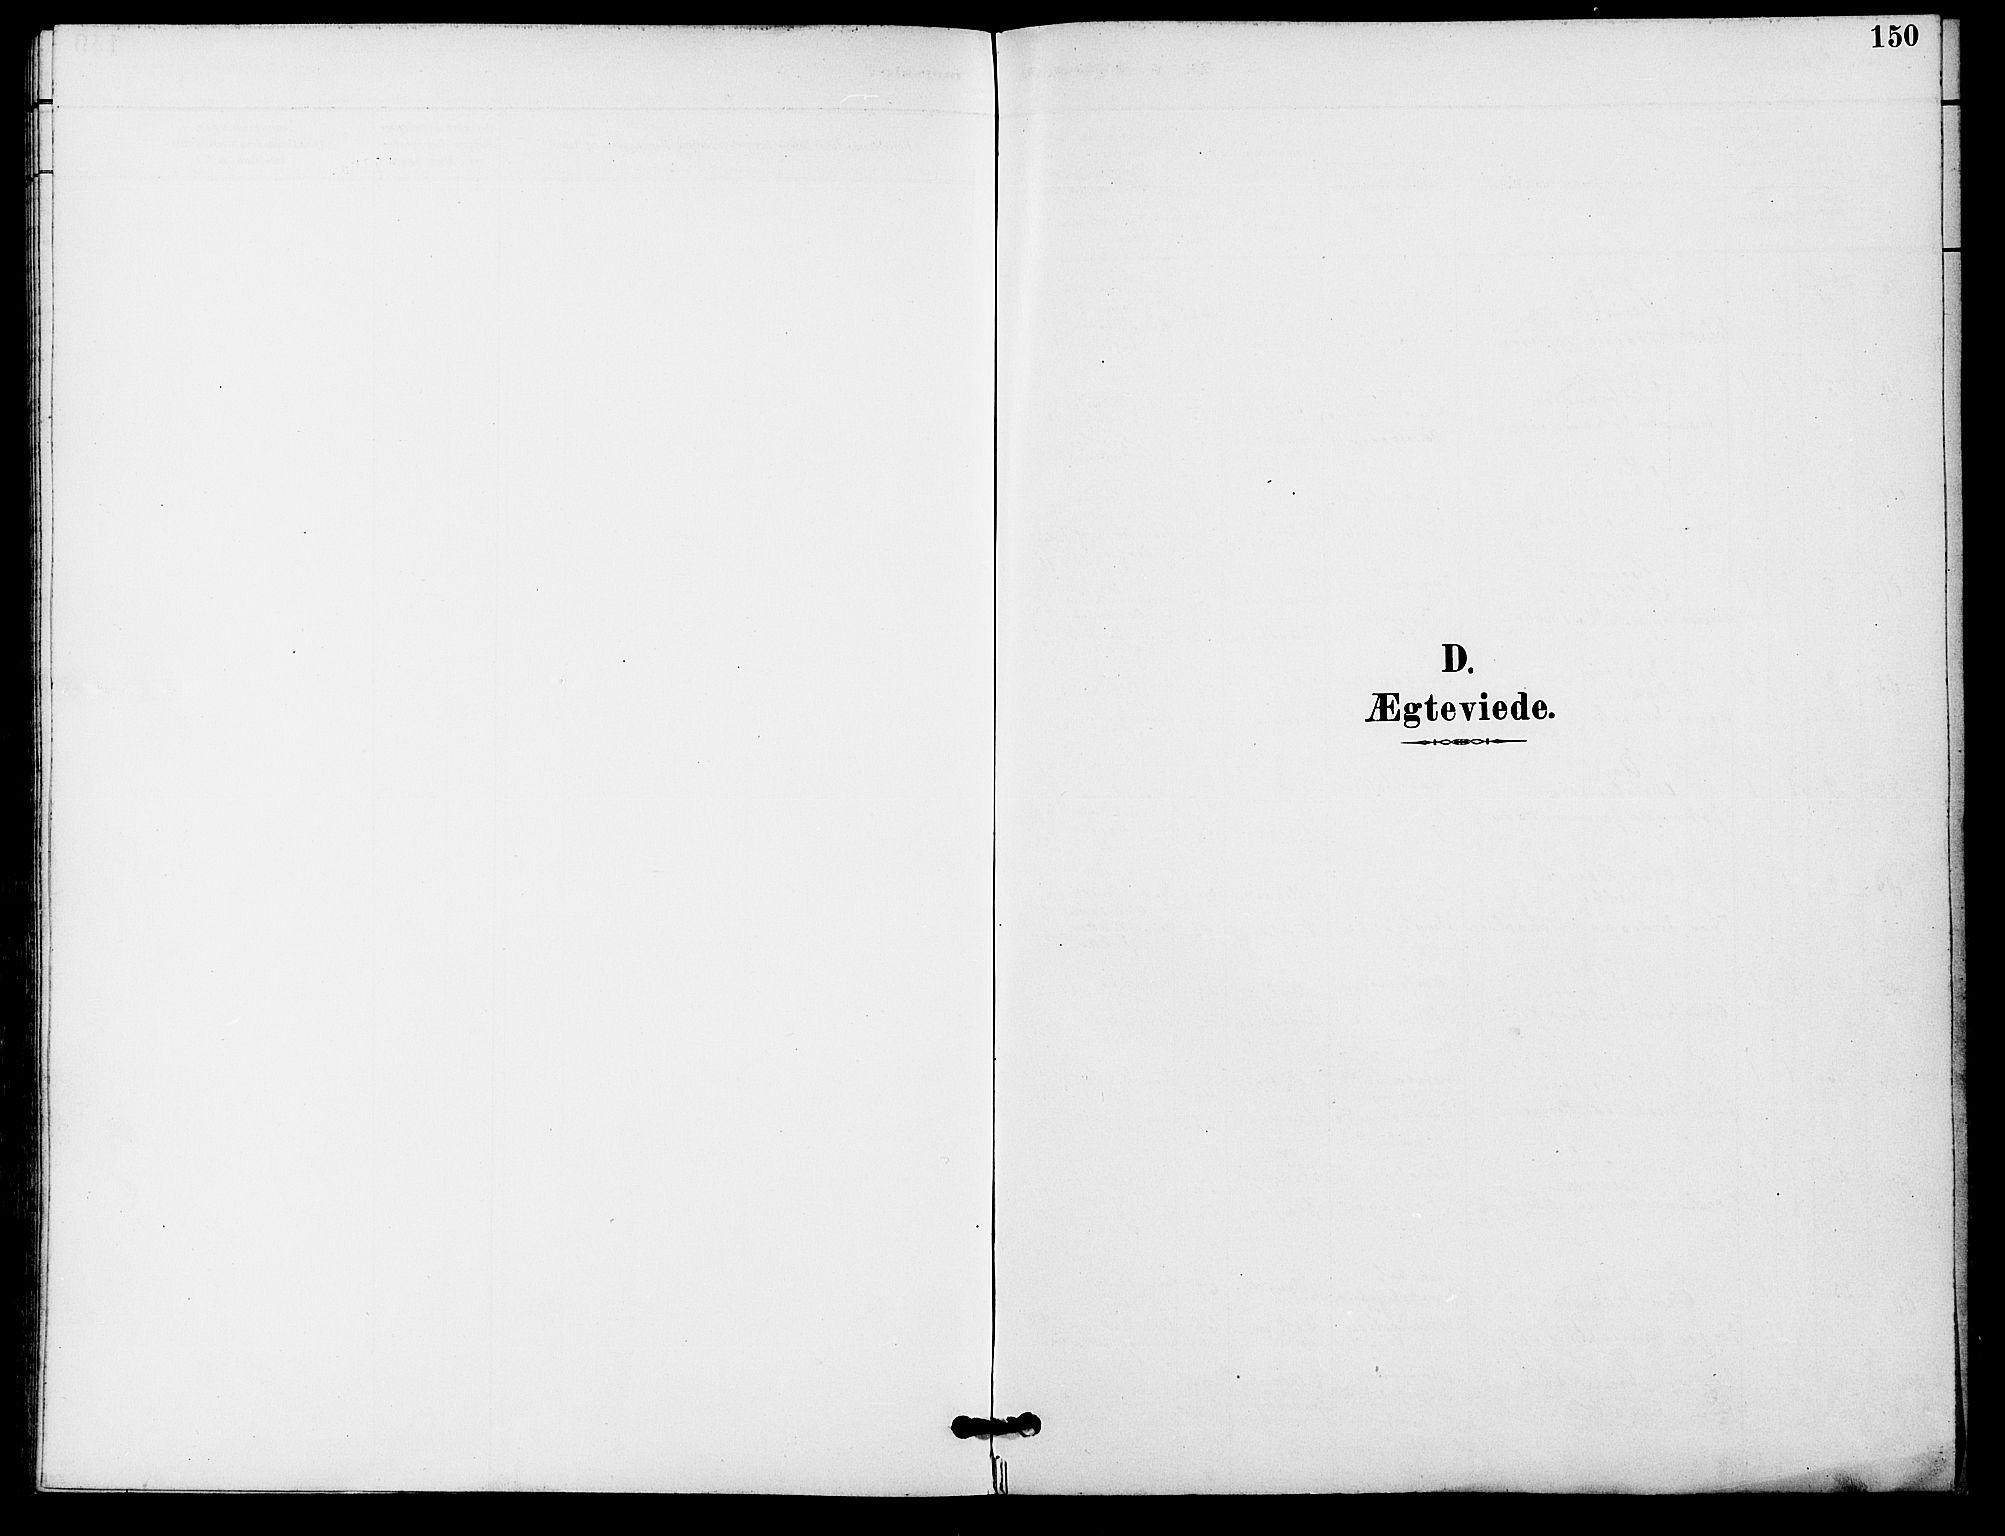 SAO, Gamle Aker prestekontor Kirkebøker, F/L0009: Parish register (official) no. 9, 1890-1898, p. 150